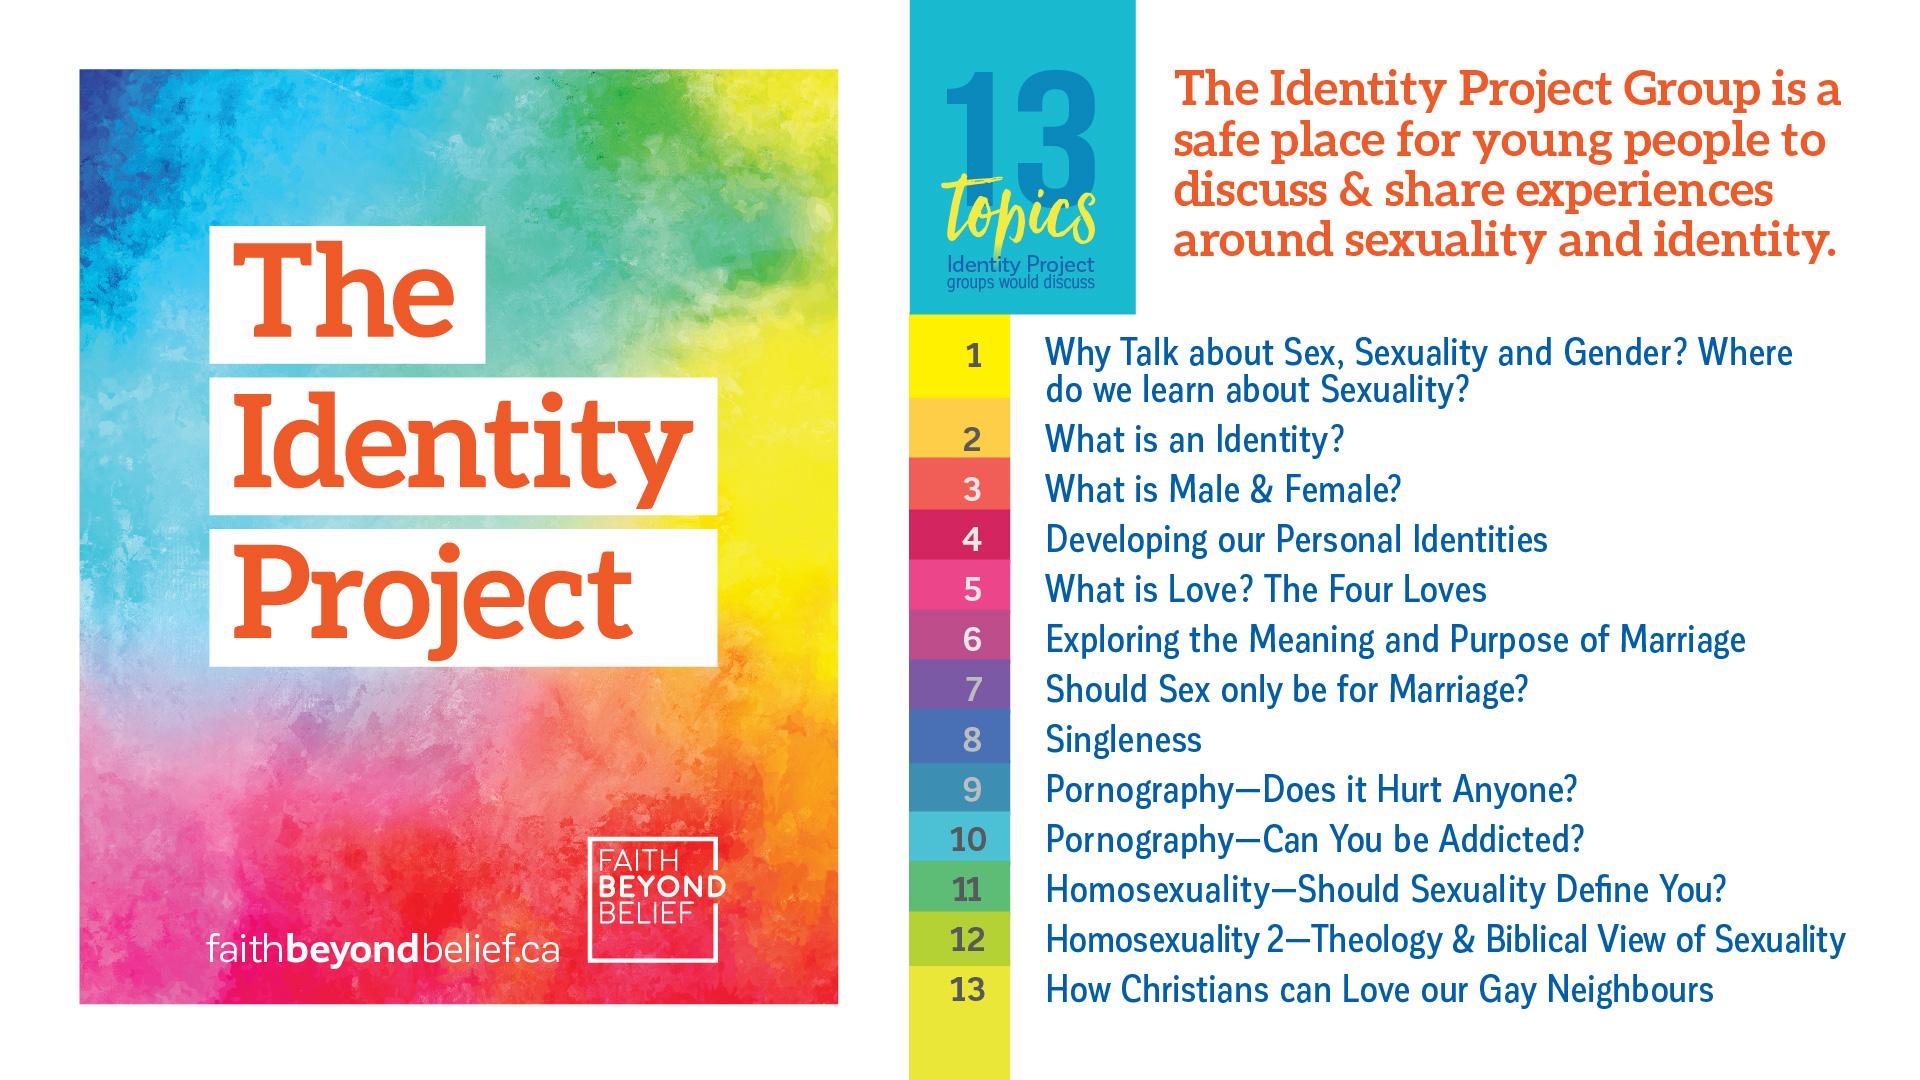 TheIdentityProject-Group-Slide-Topics-2018.jpg